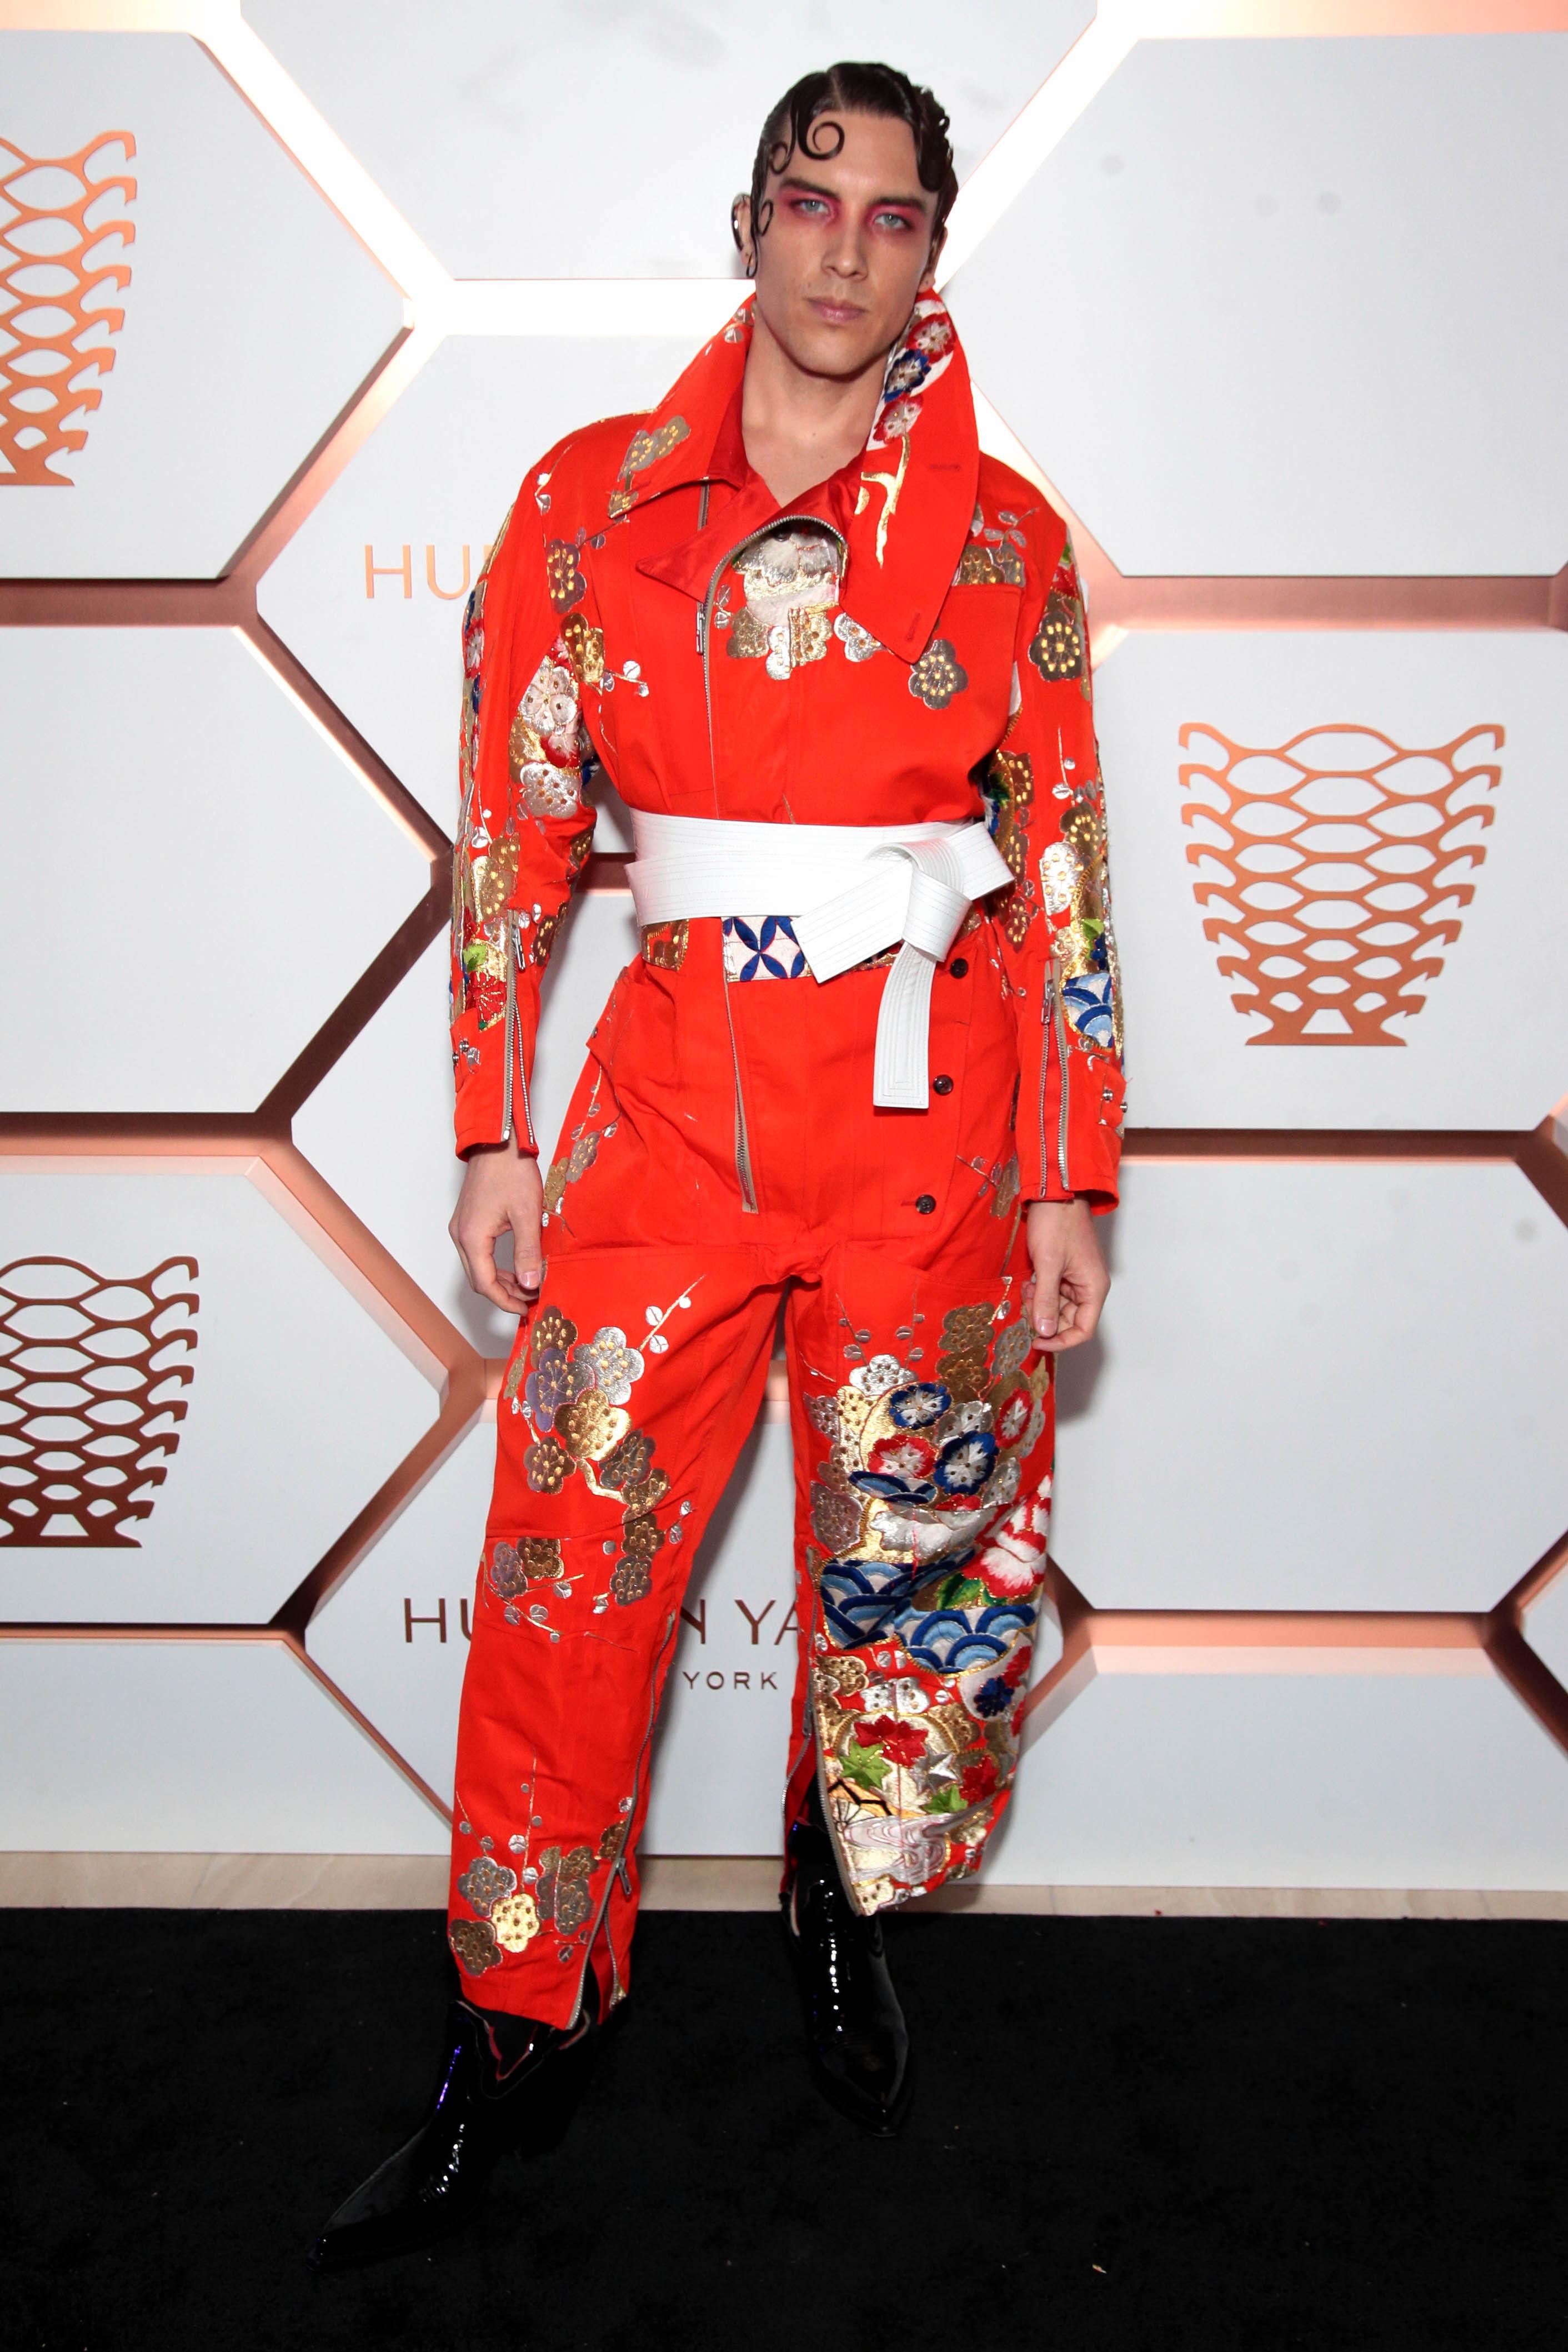 MET Gala 2019 - Cody Fern en Maison Margiela Artisanal pour Homme par John Galliano